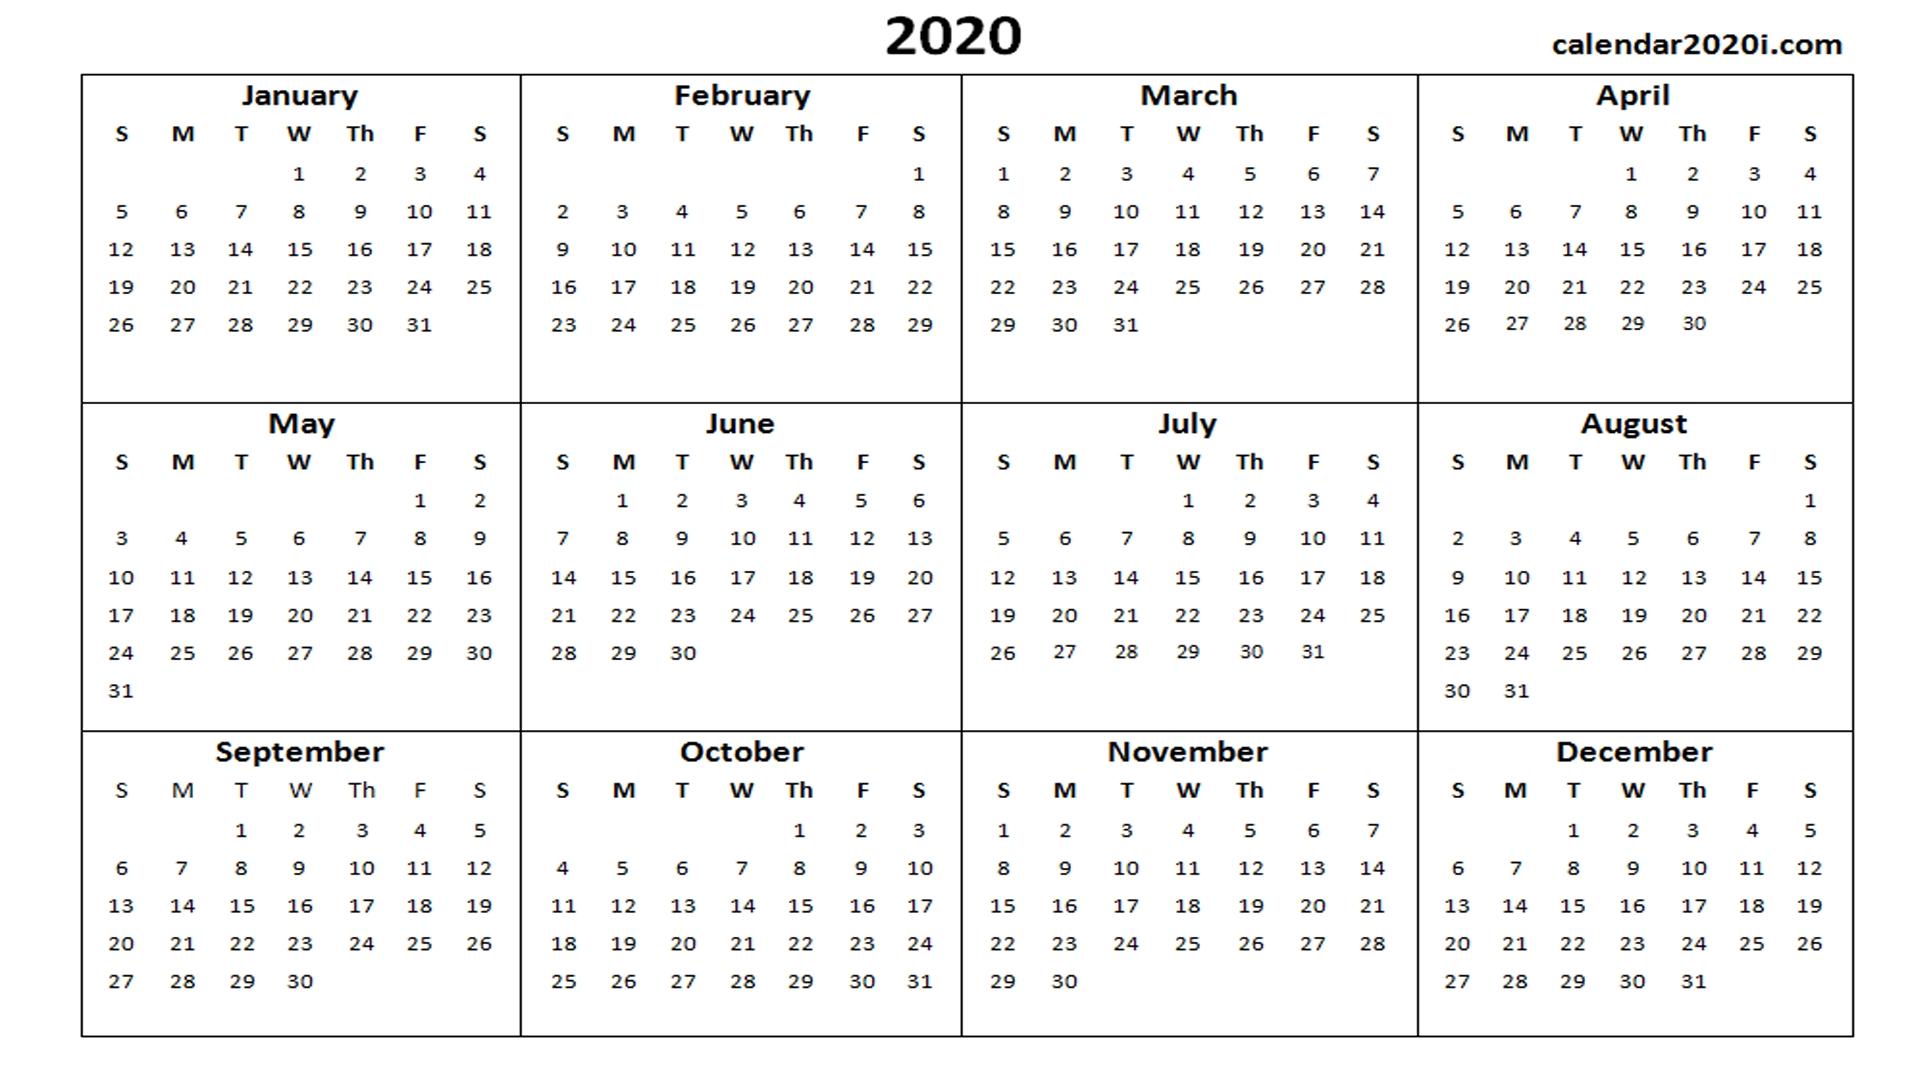 2020 Calendar Printable Template Holidays, Word, Excel, Pdf  2020 Calendar Template